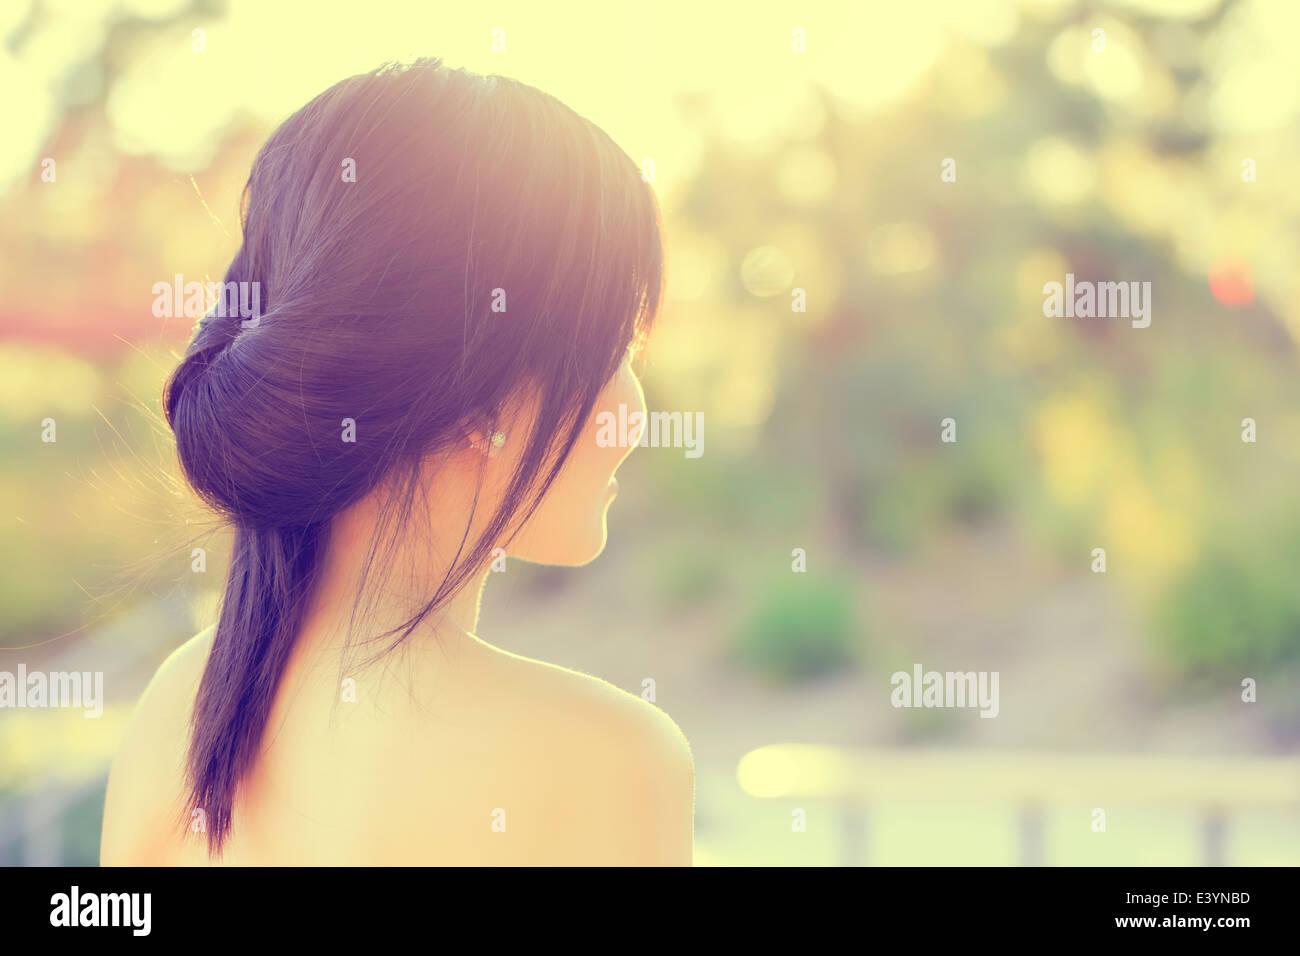 Retrato de muchacha asiáticaFoto de stock